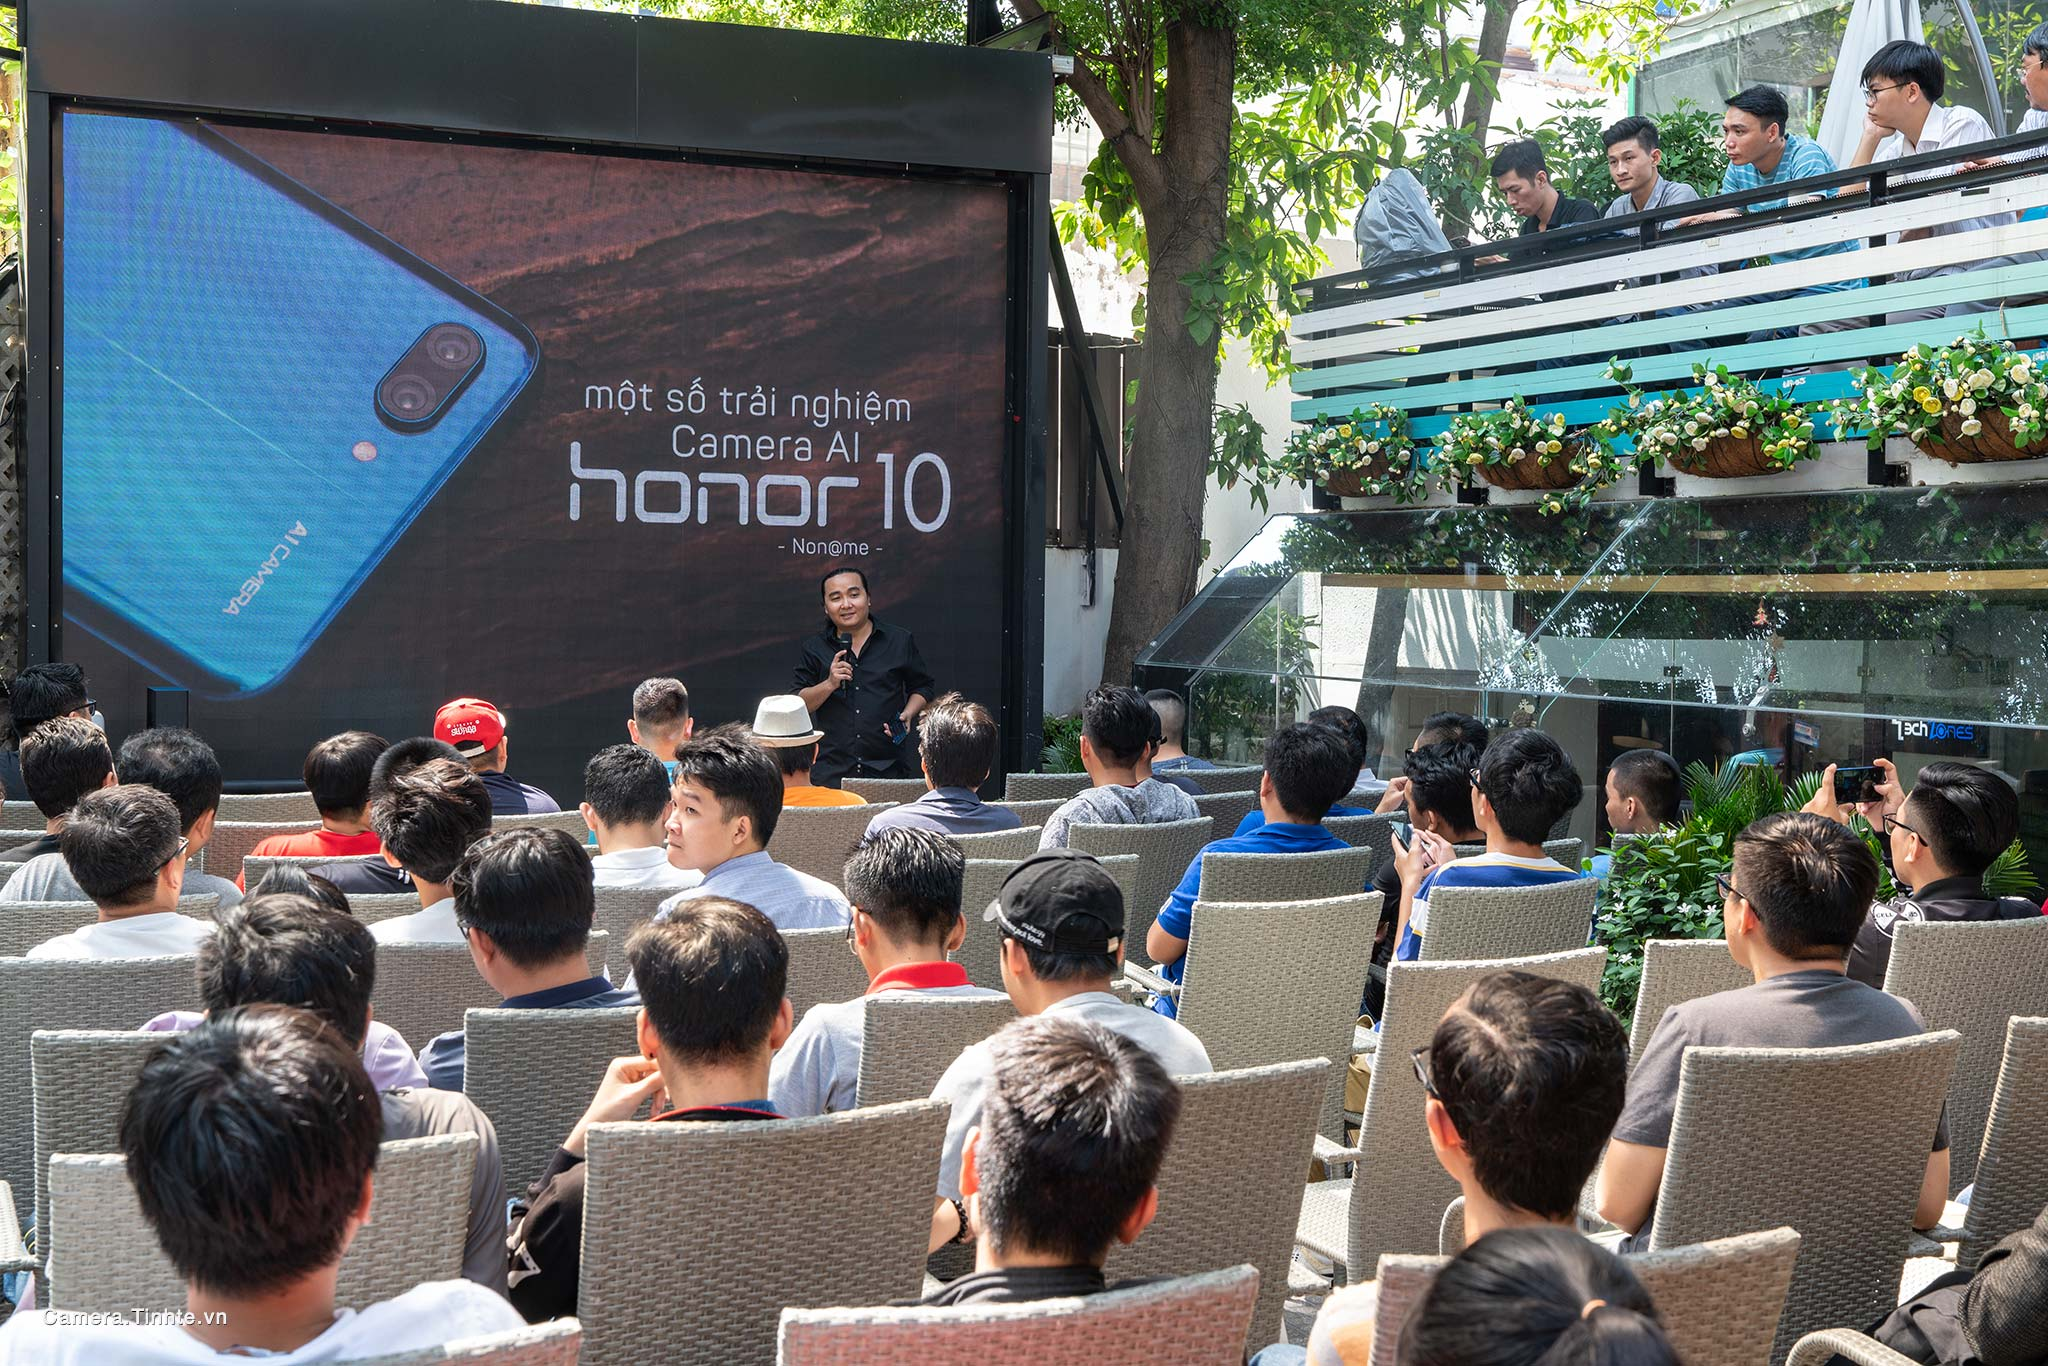 Camera.Tinhte.vn_Offline-trai-nghiem-Honor10_DSC03425.jpg